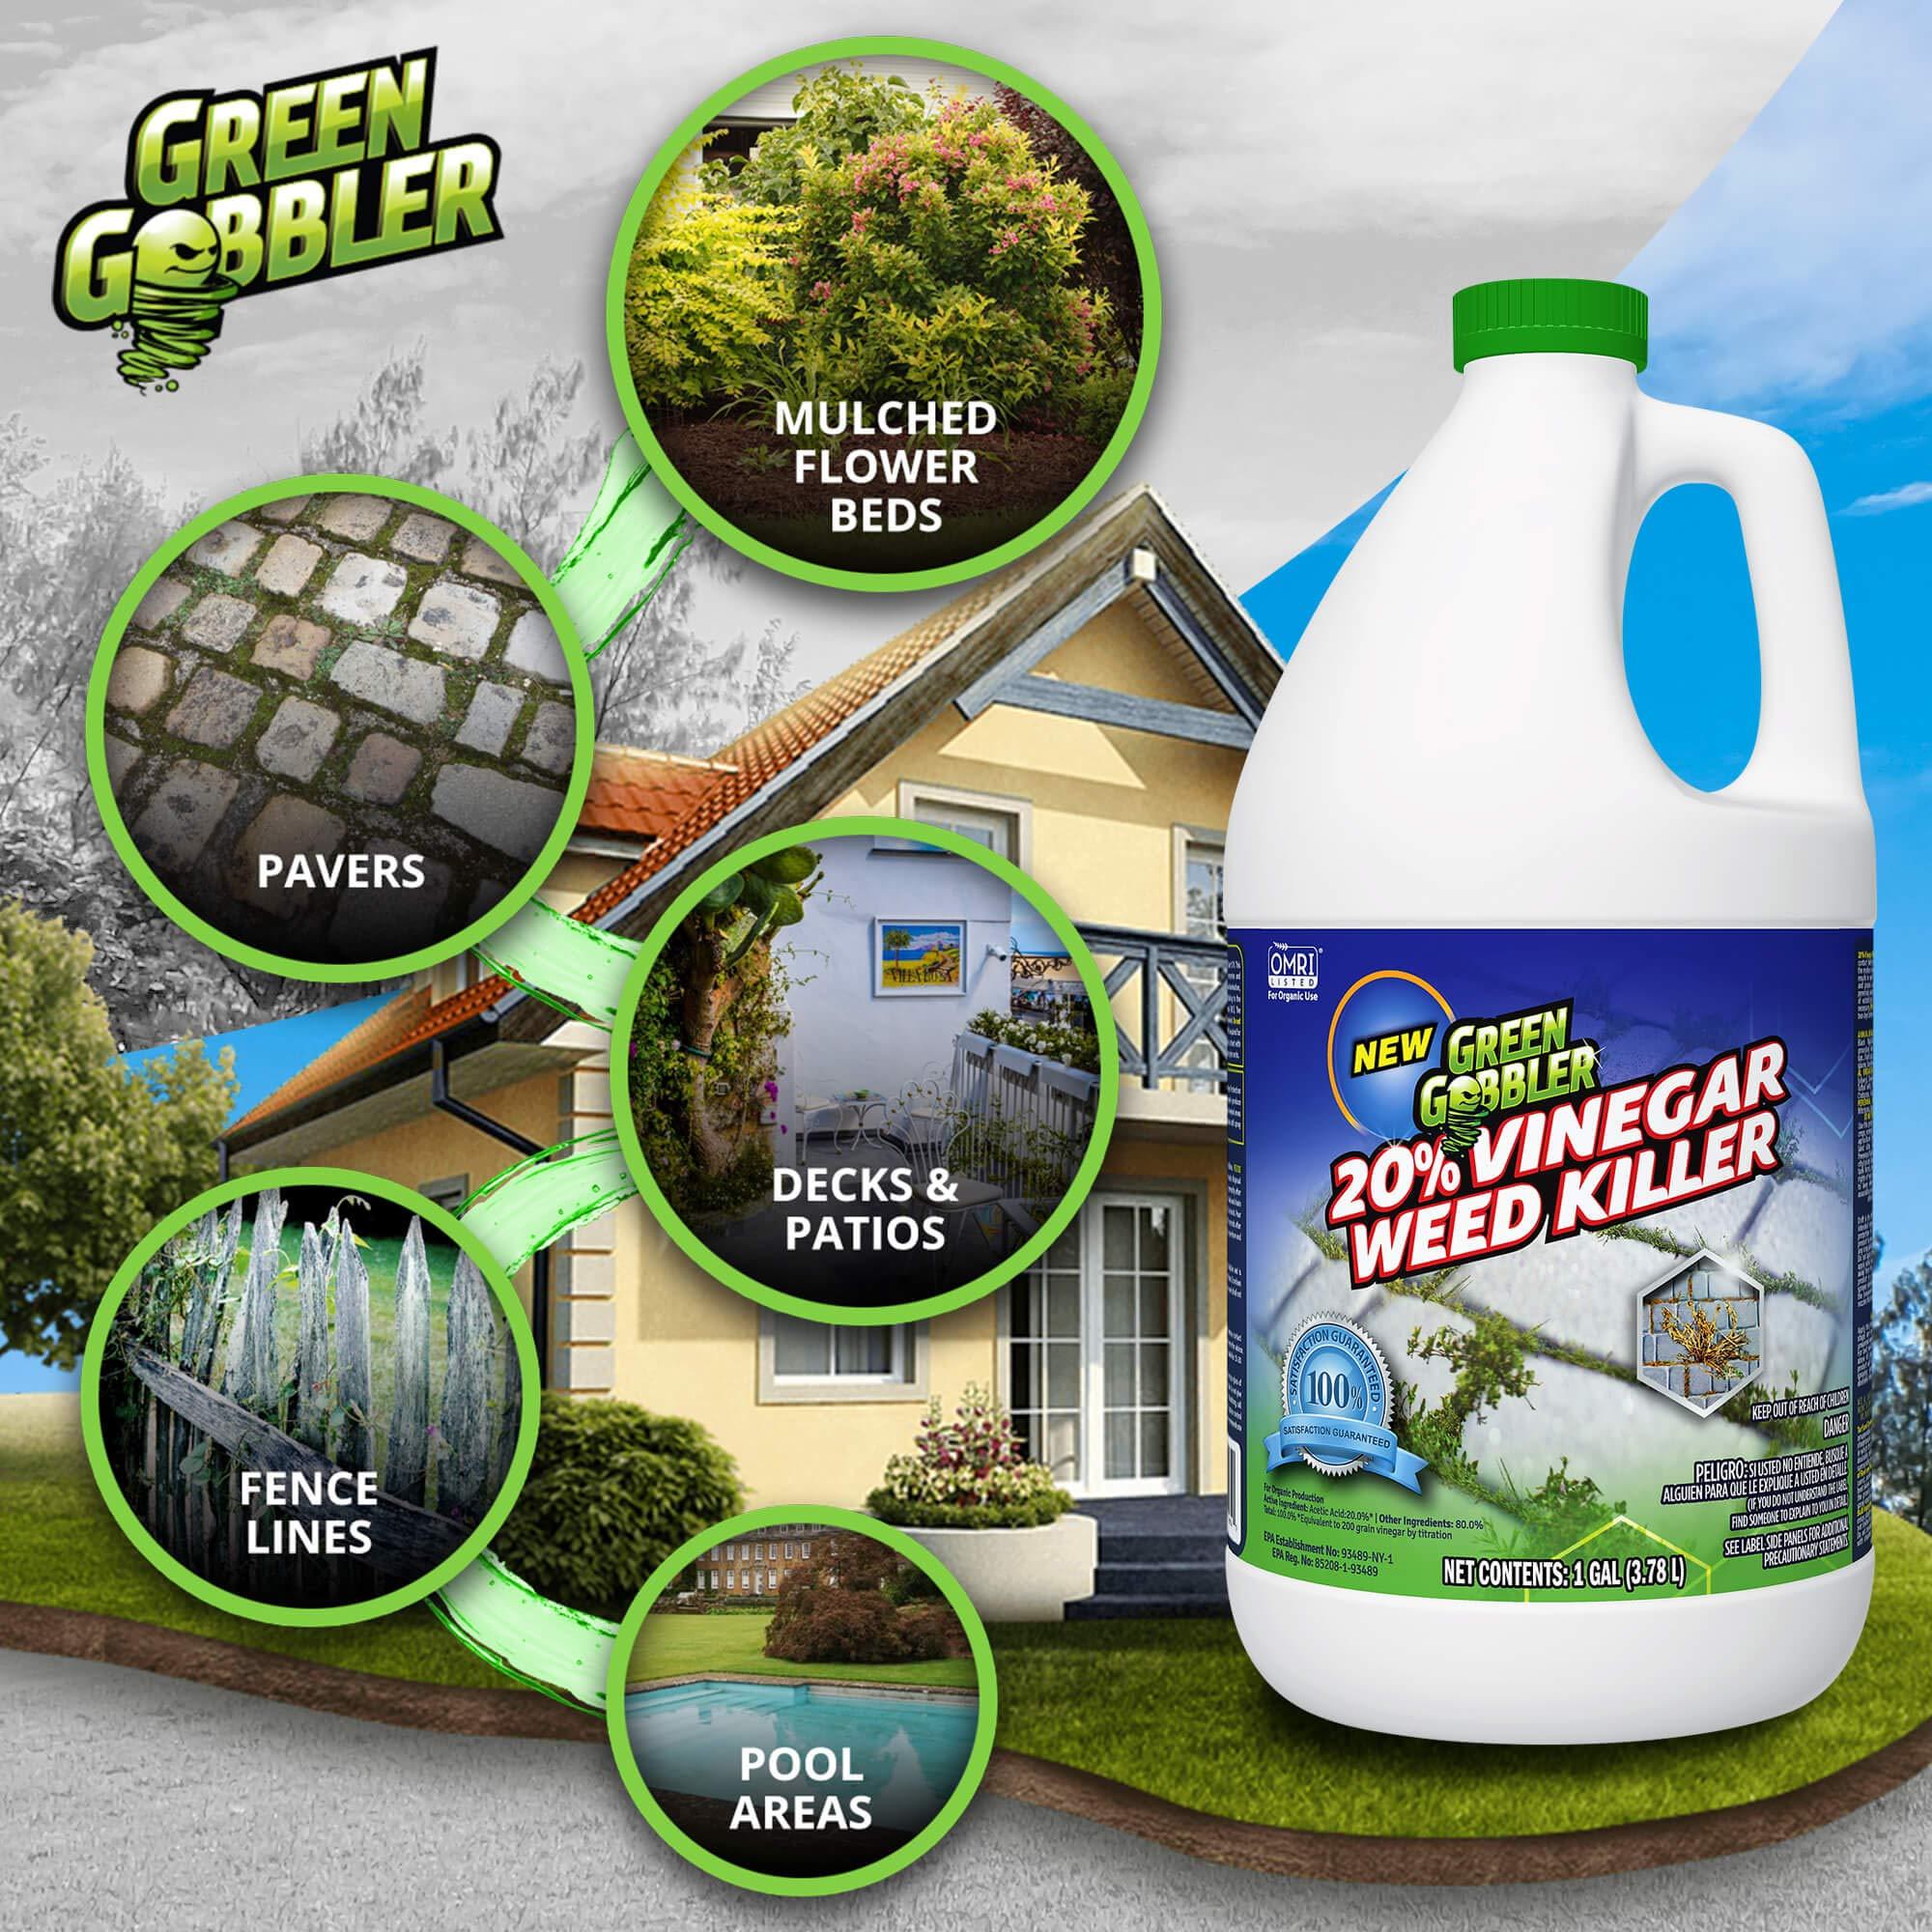 Green Gobbler 20% Horticultural Vinegar Weed Killer   Herbicide   Natural Weed Killer   Organic Weed Killer (5 Gallon Pail) by Green Gobbler (Image #4)